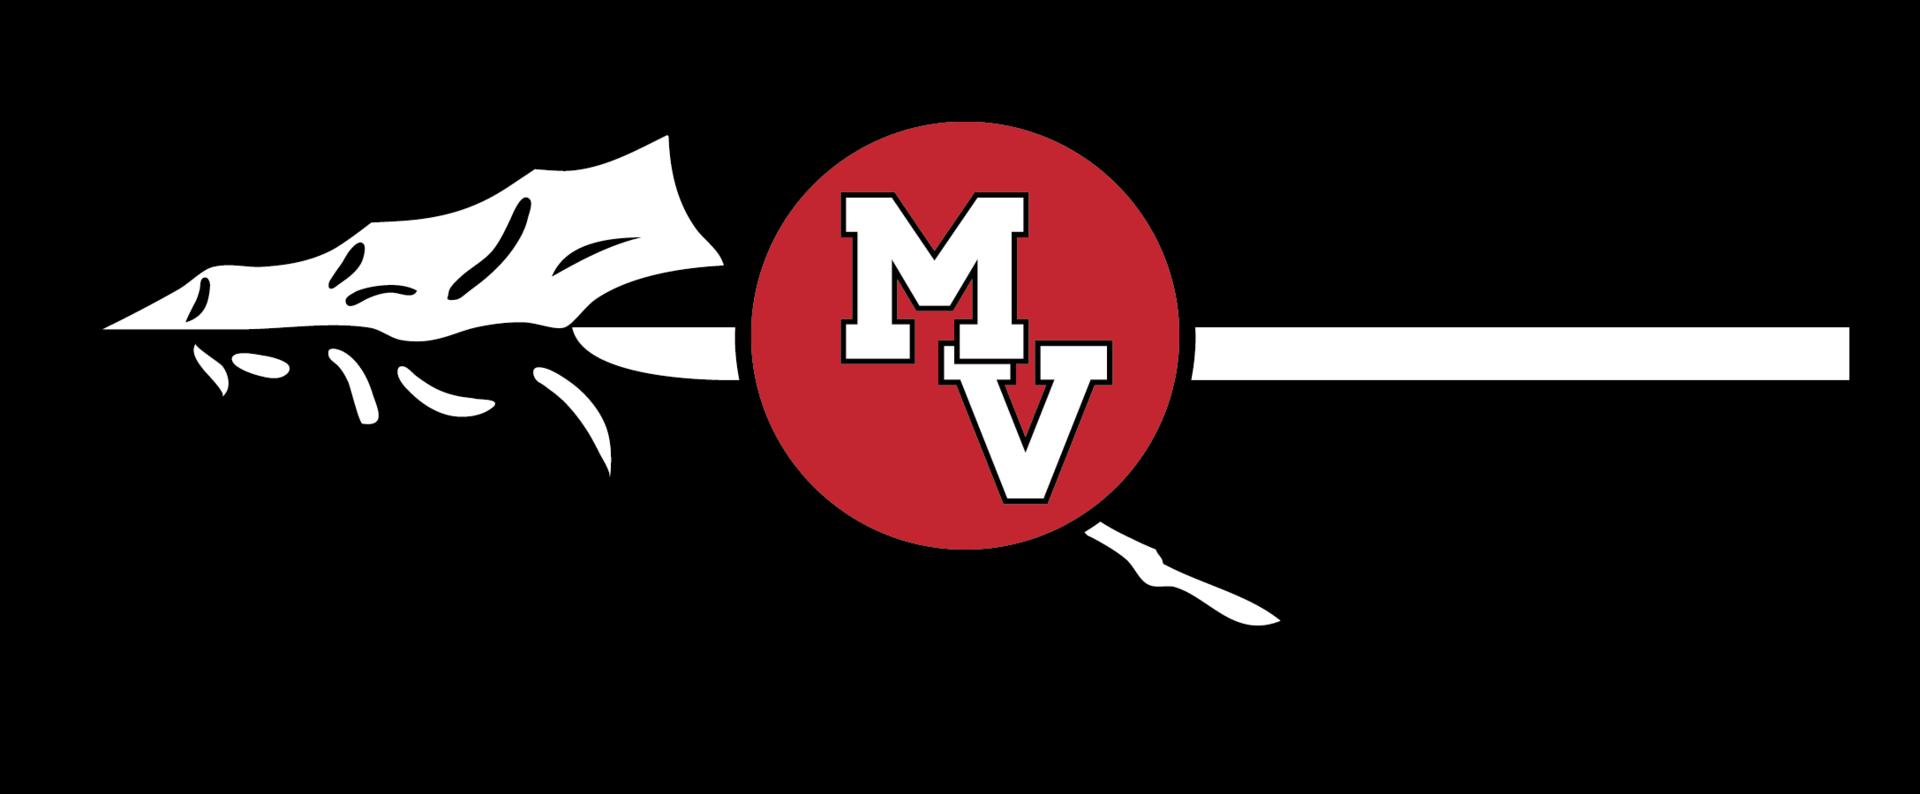 Missouri Valley CSD School Mascot Arrowhead